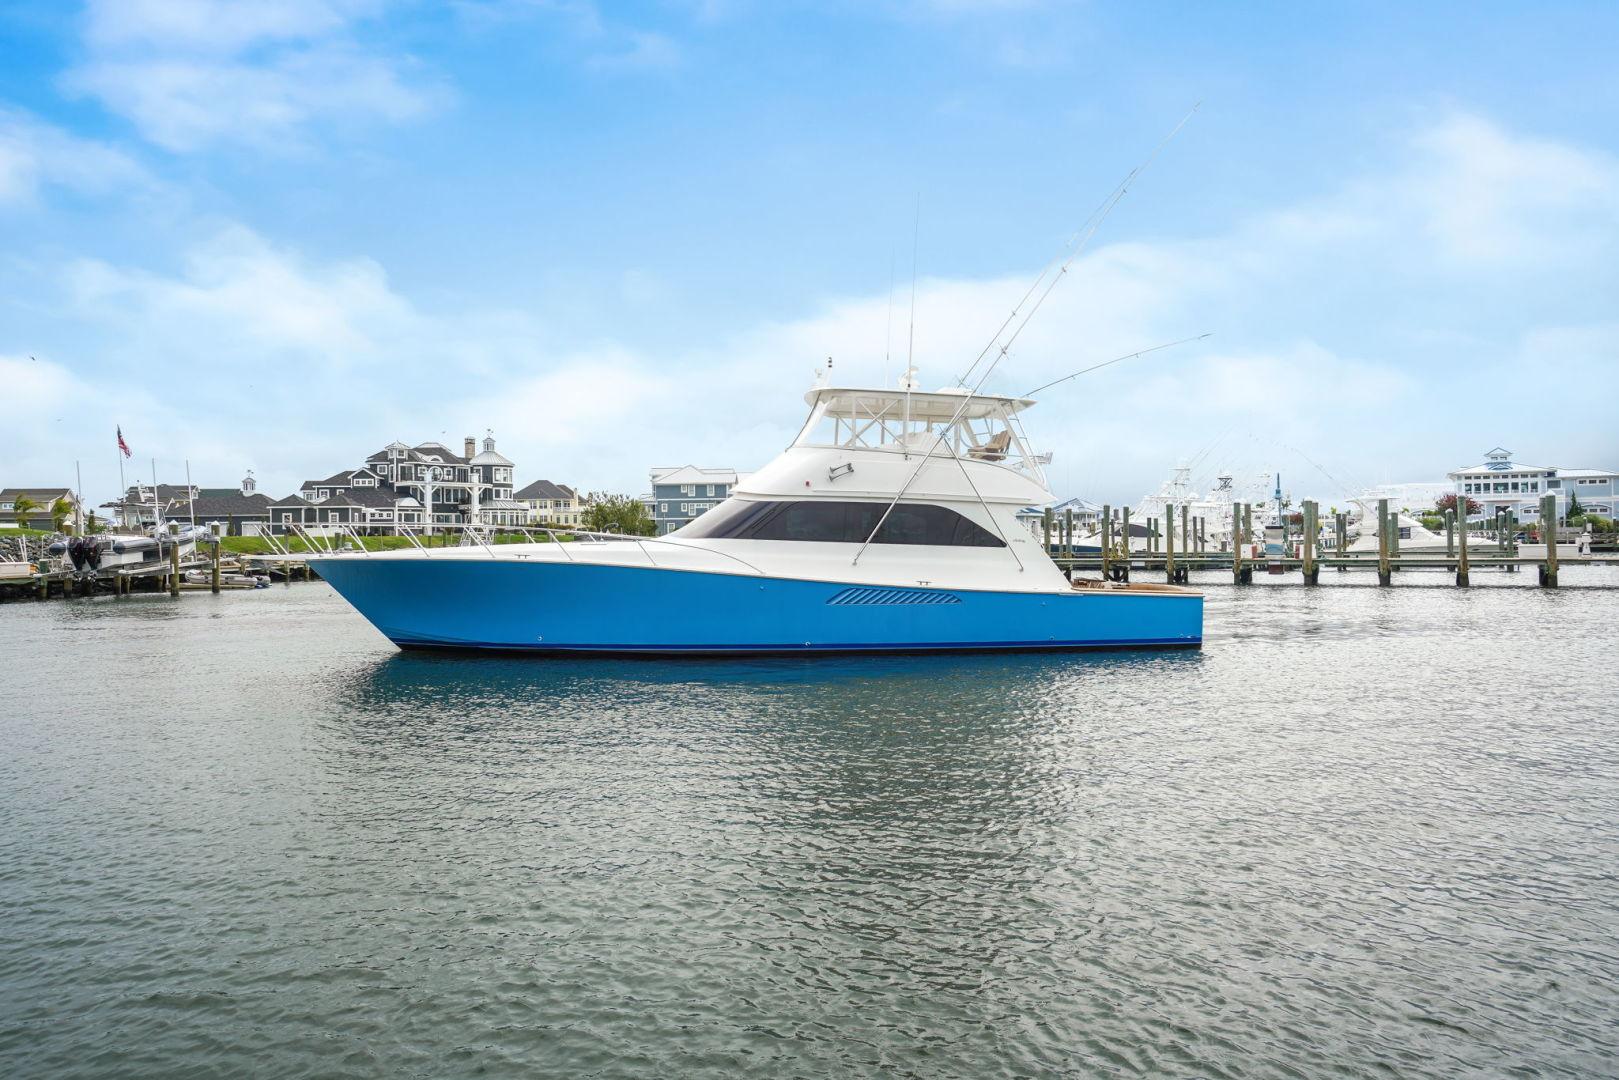 Viking-Convertible 2002-Blue Eyes North Palm Beach-Florida-United States-Blue Eyes-1490422   Thumbnail